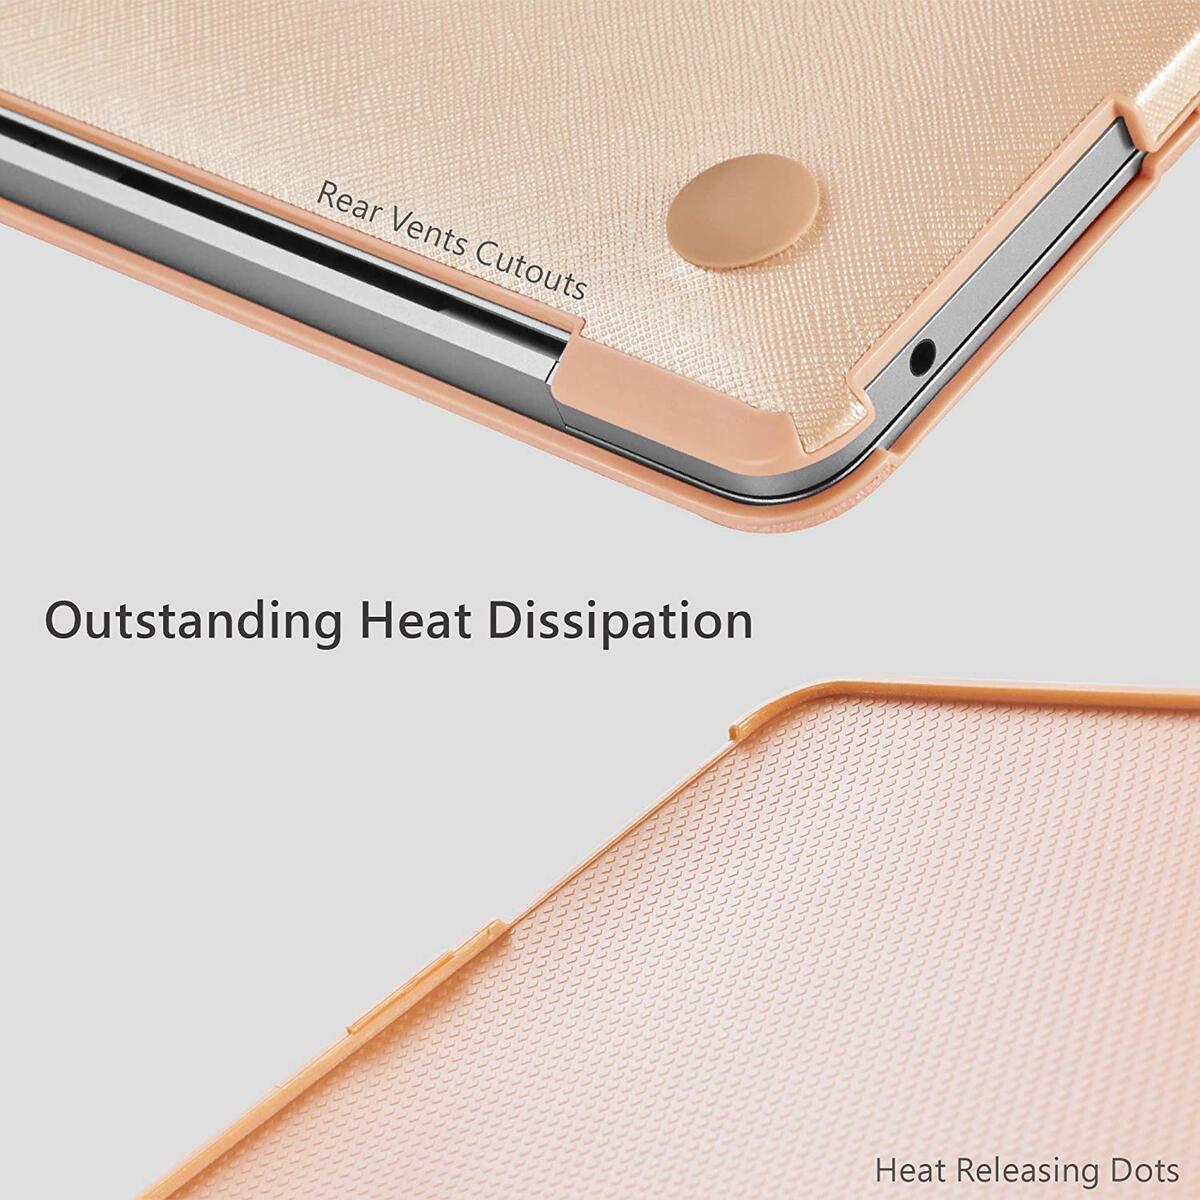 PROXA MacBook Air Retina 13 inch Case Released 2018 & 2019, Splendor Series Hardshell Case Cover for MacBook Air Retina 13 inch 2018 & 2019, A1932-Rose Gold